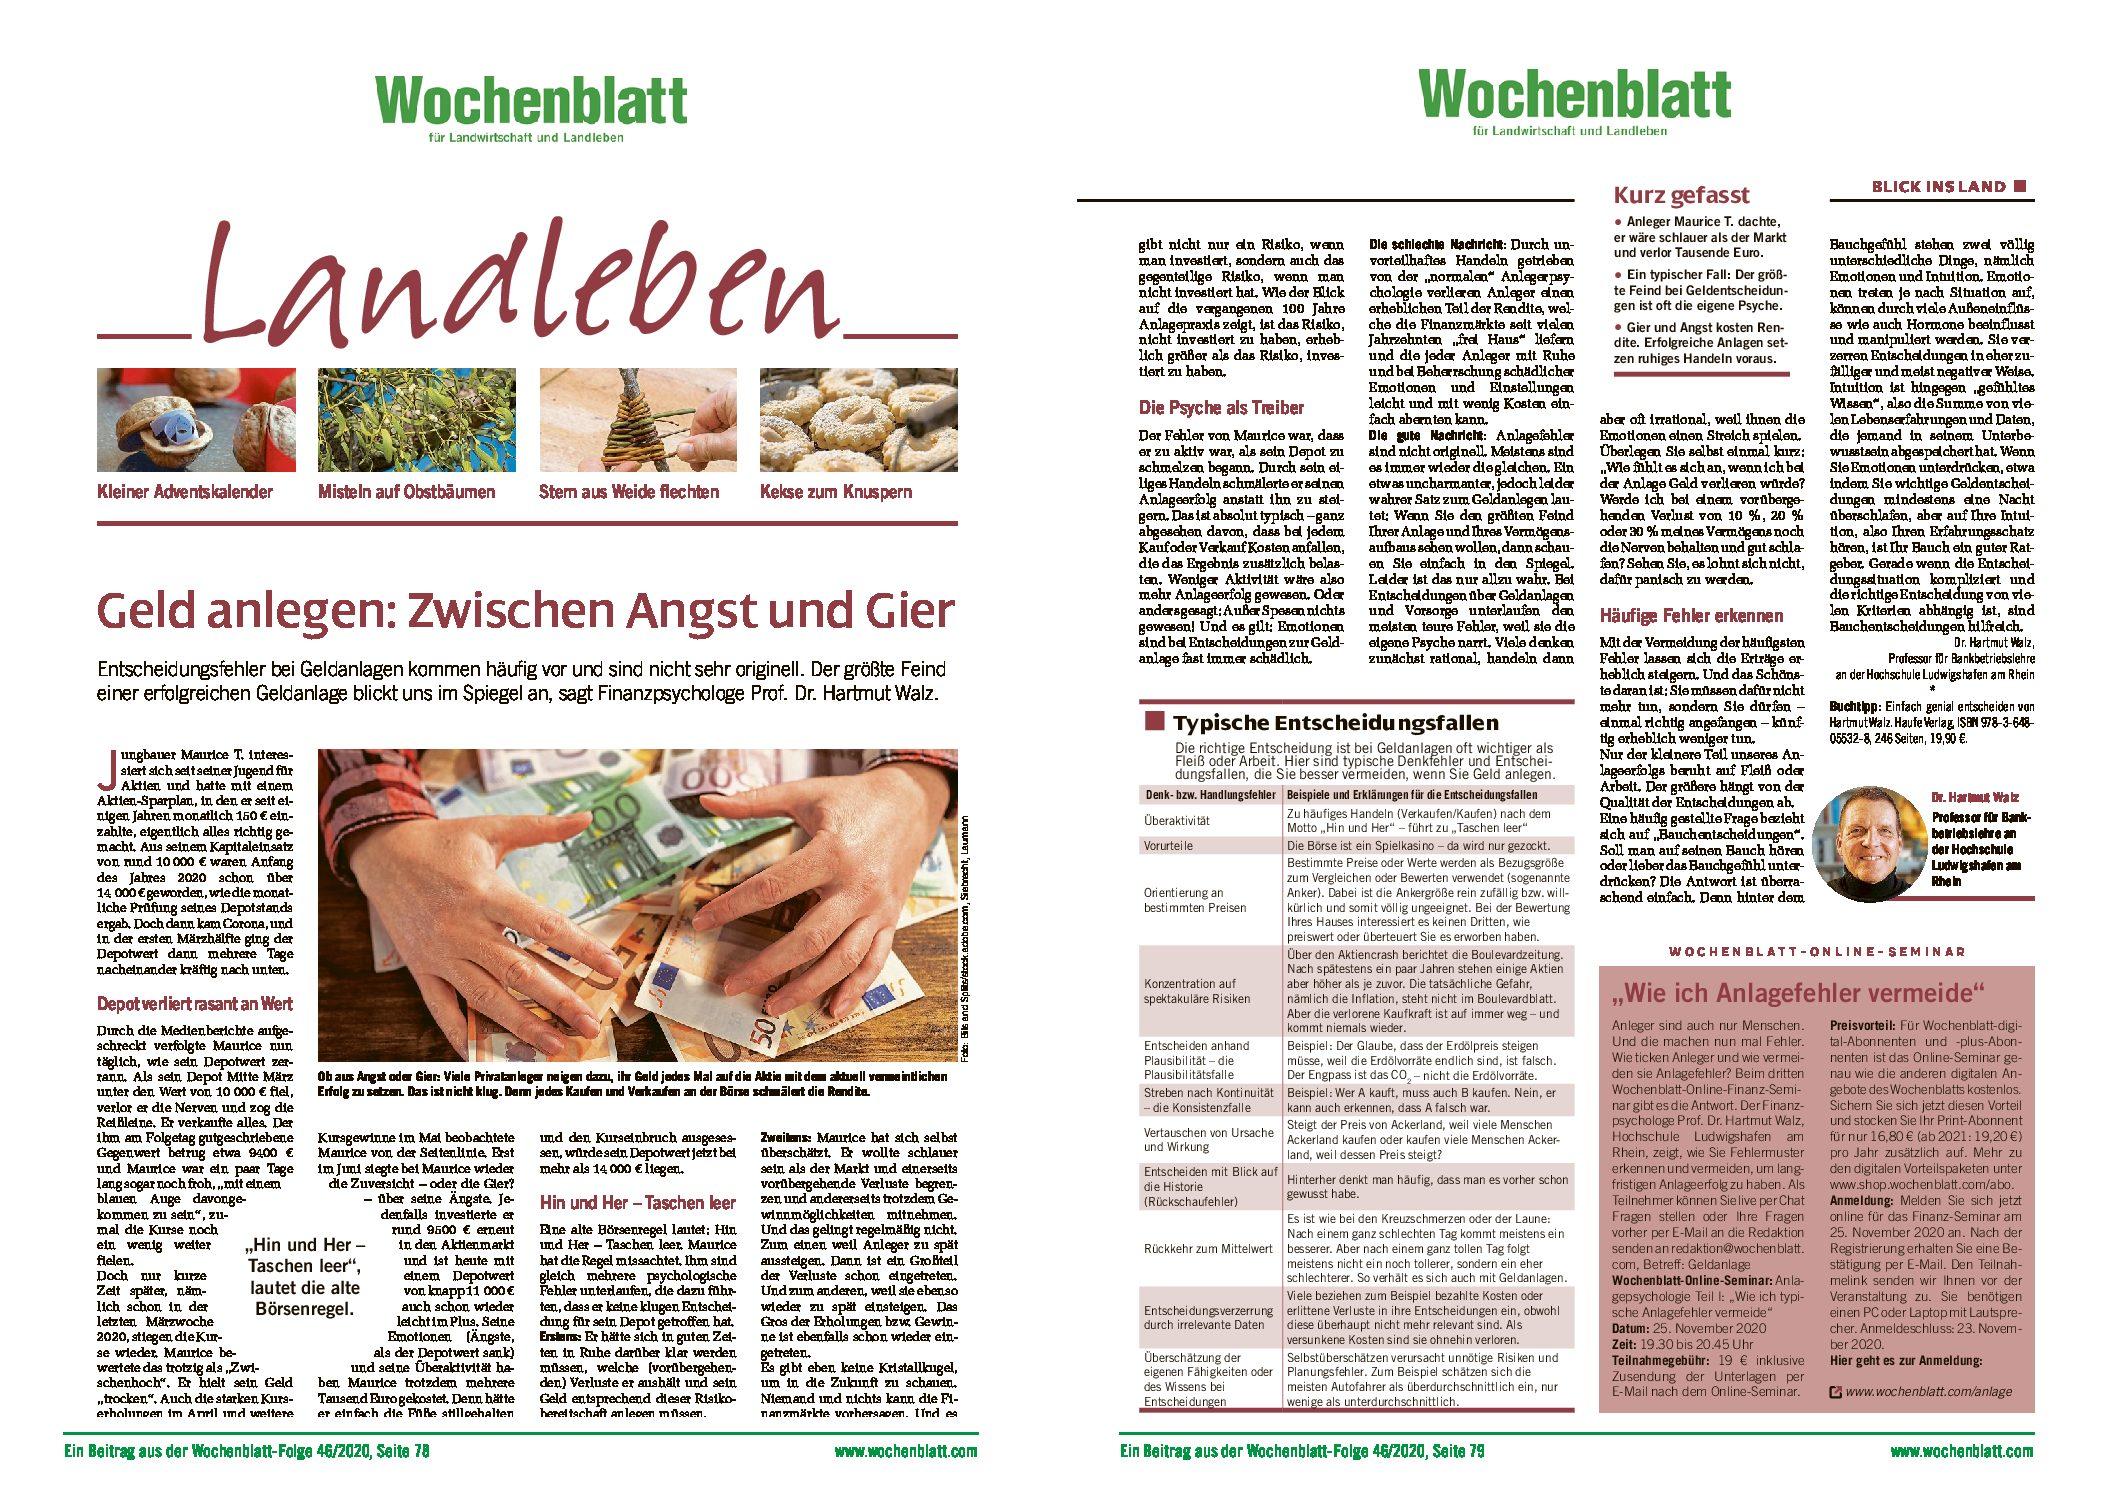 Wochenblatt 46-20